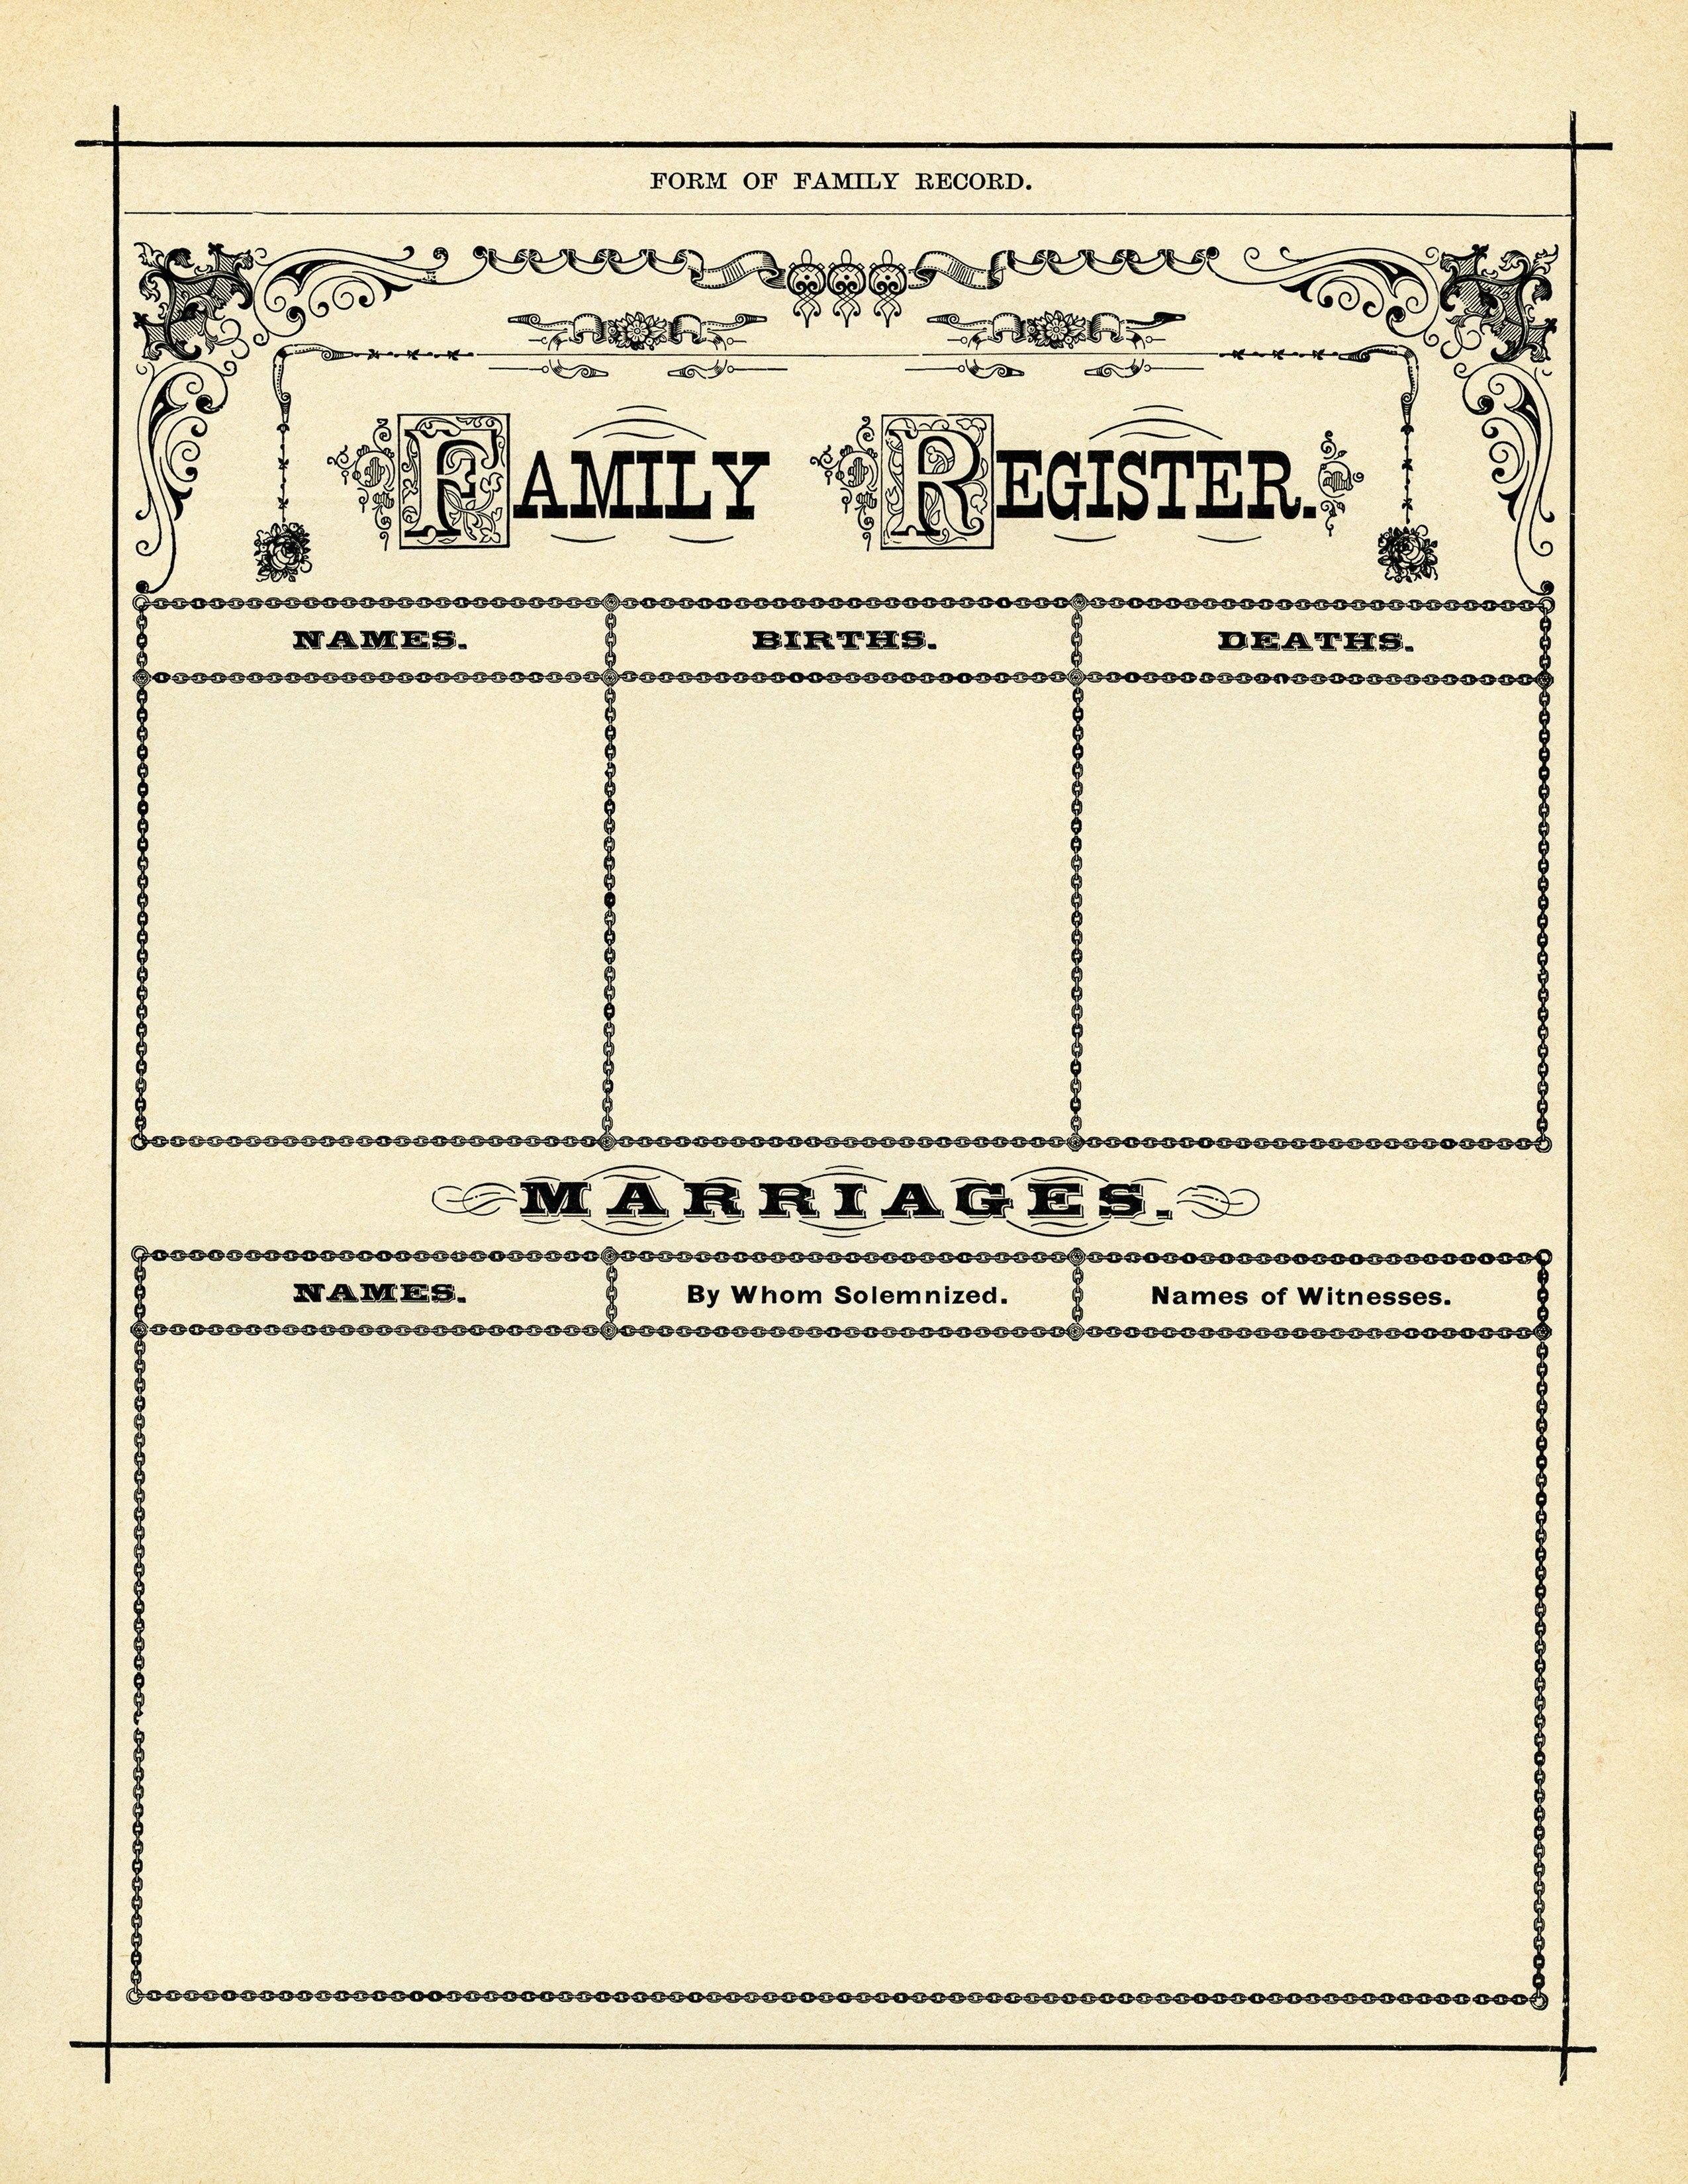 antique family register, genealogy form, family history form.